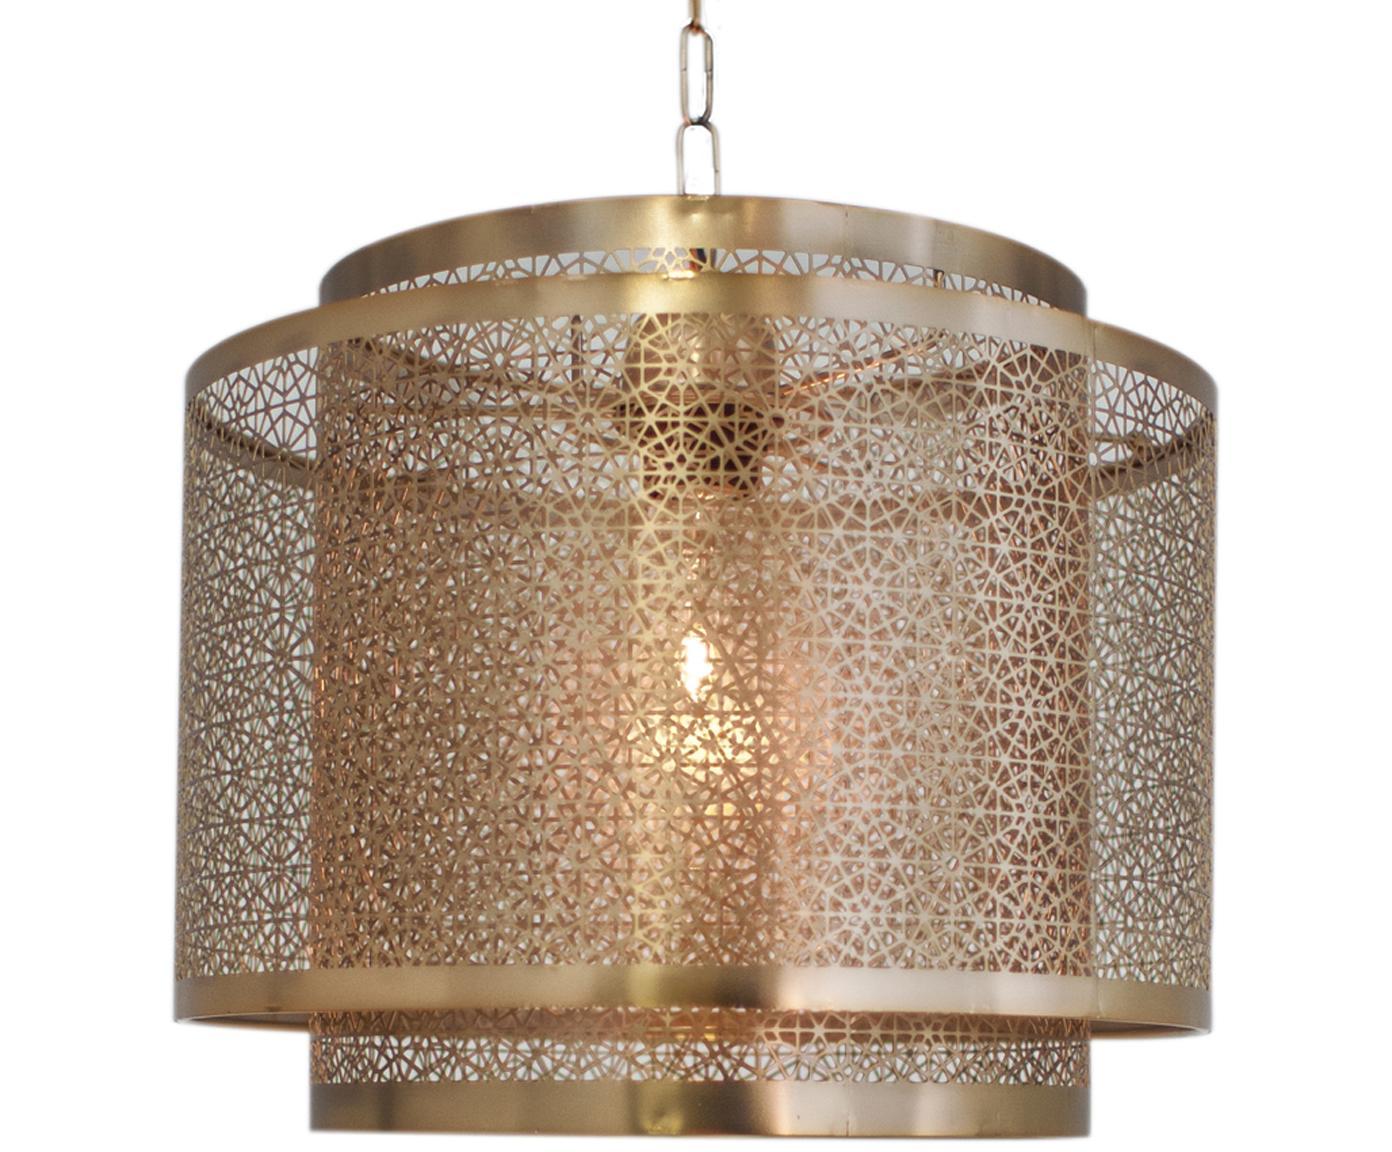 Lámpara de techo Hermine, estilo boho, Latón, Latón mate, Ø 35 x Al 28 cm